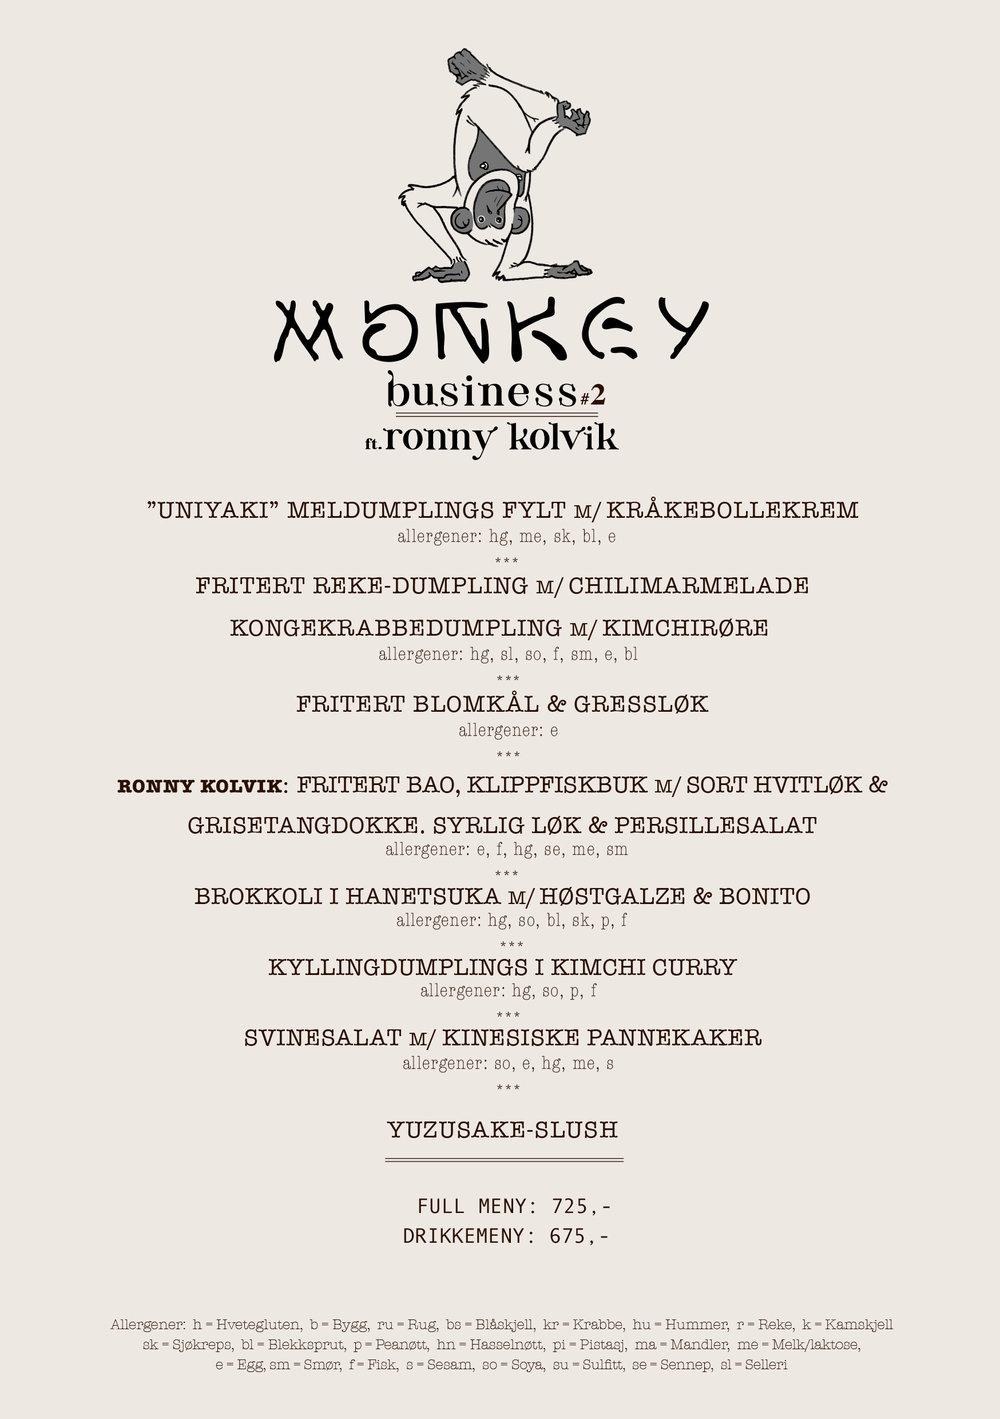 golden_chimp_monkey business_2_meny.indd